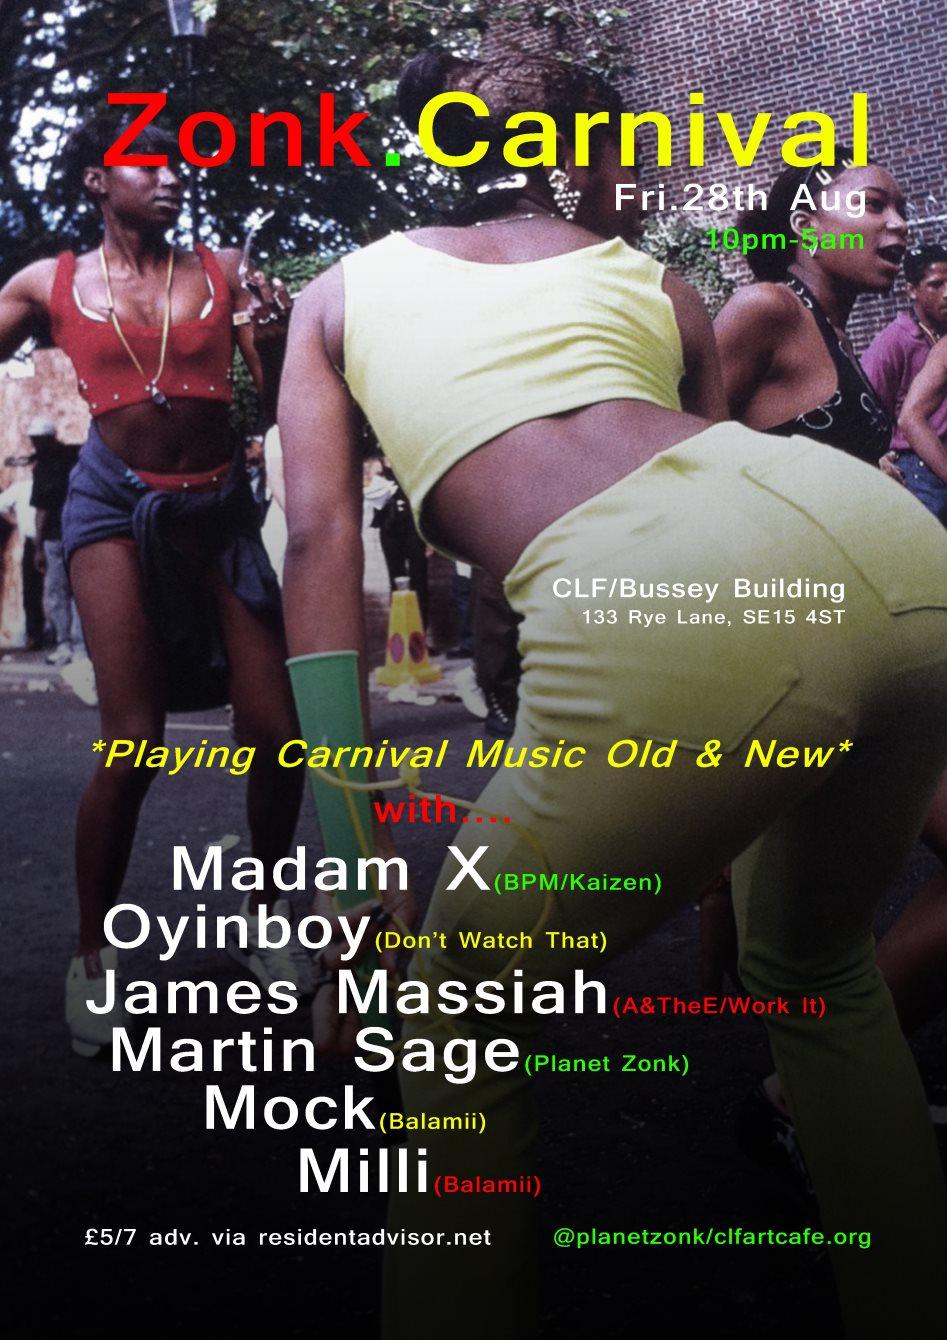 RA: Zonk Carnival with Madam X, Oyinboy, James Massiah ++ Bank